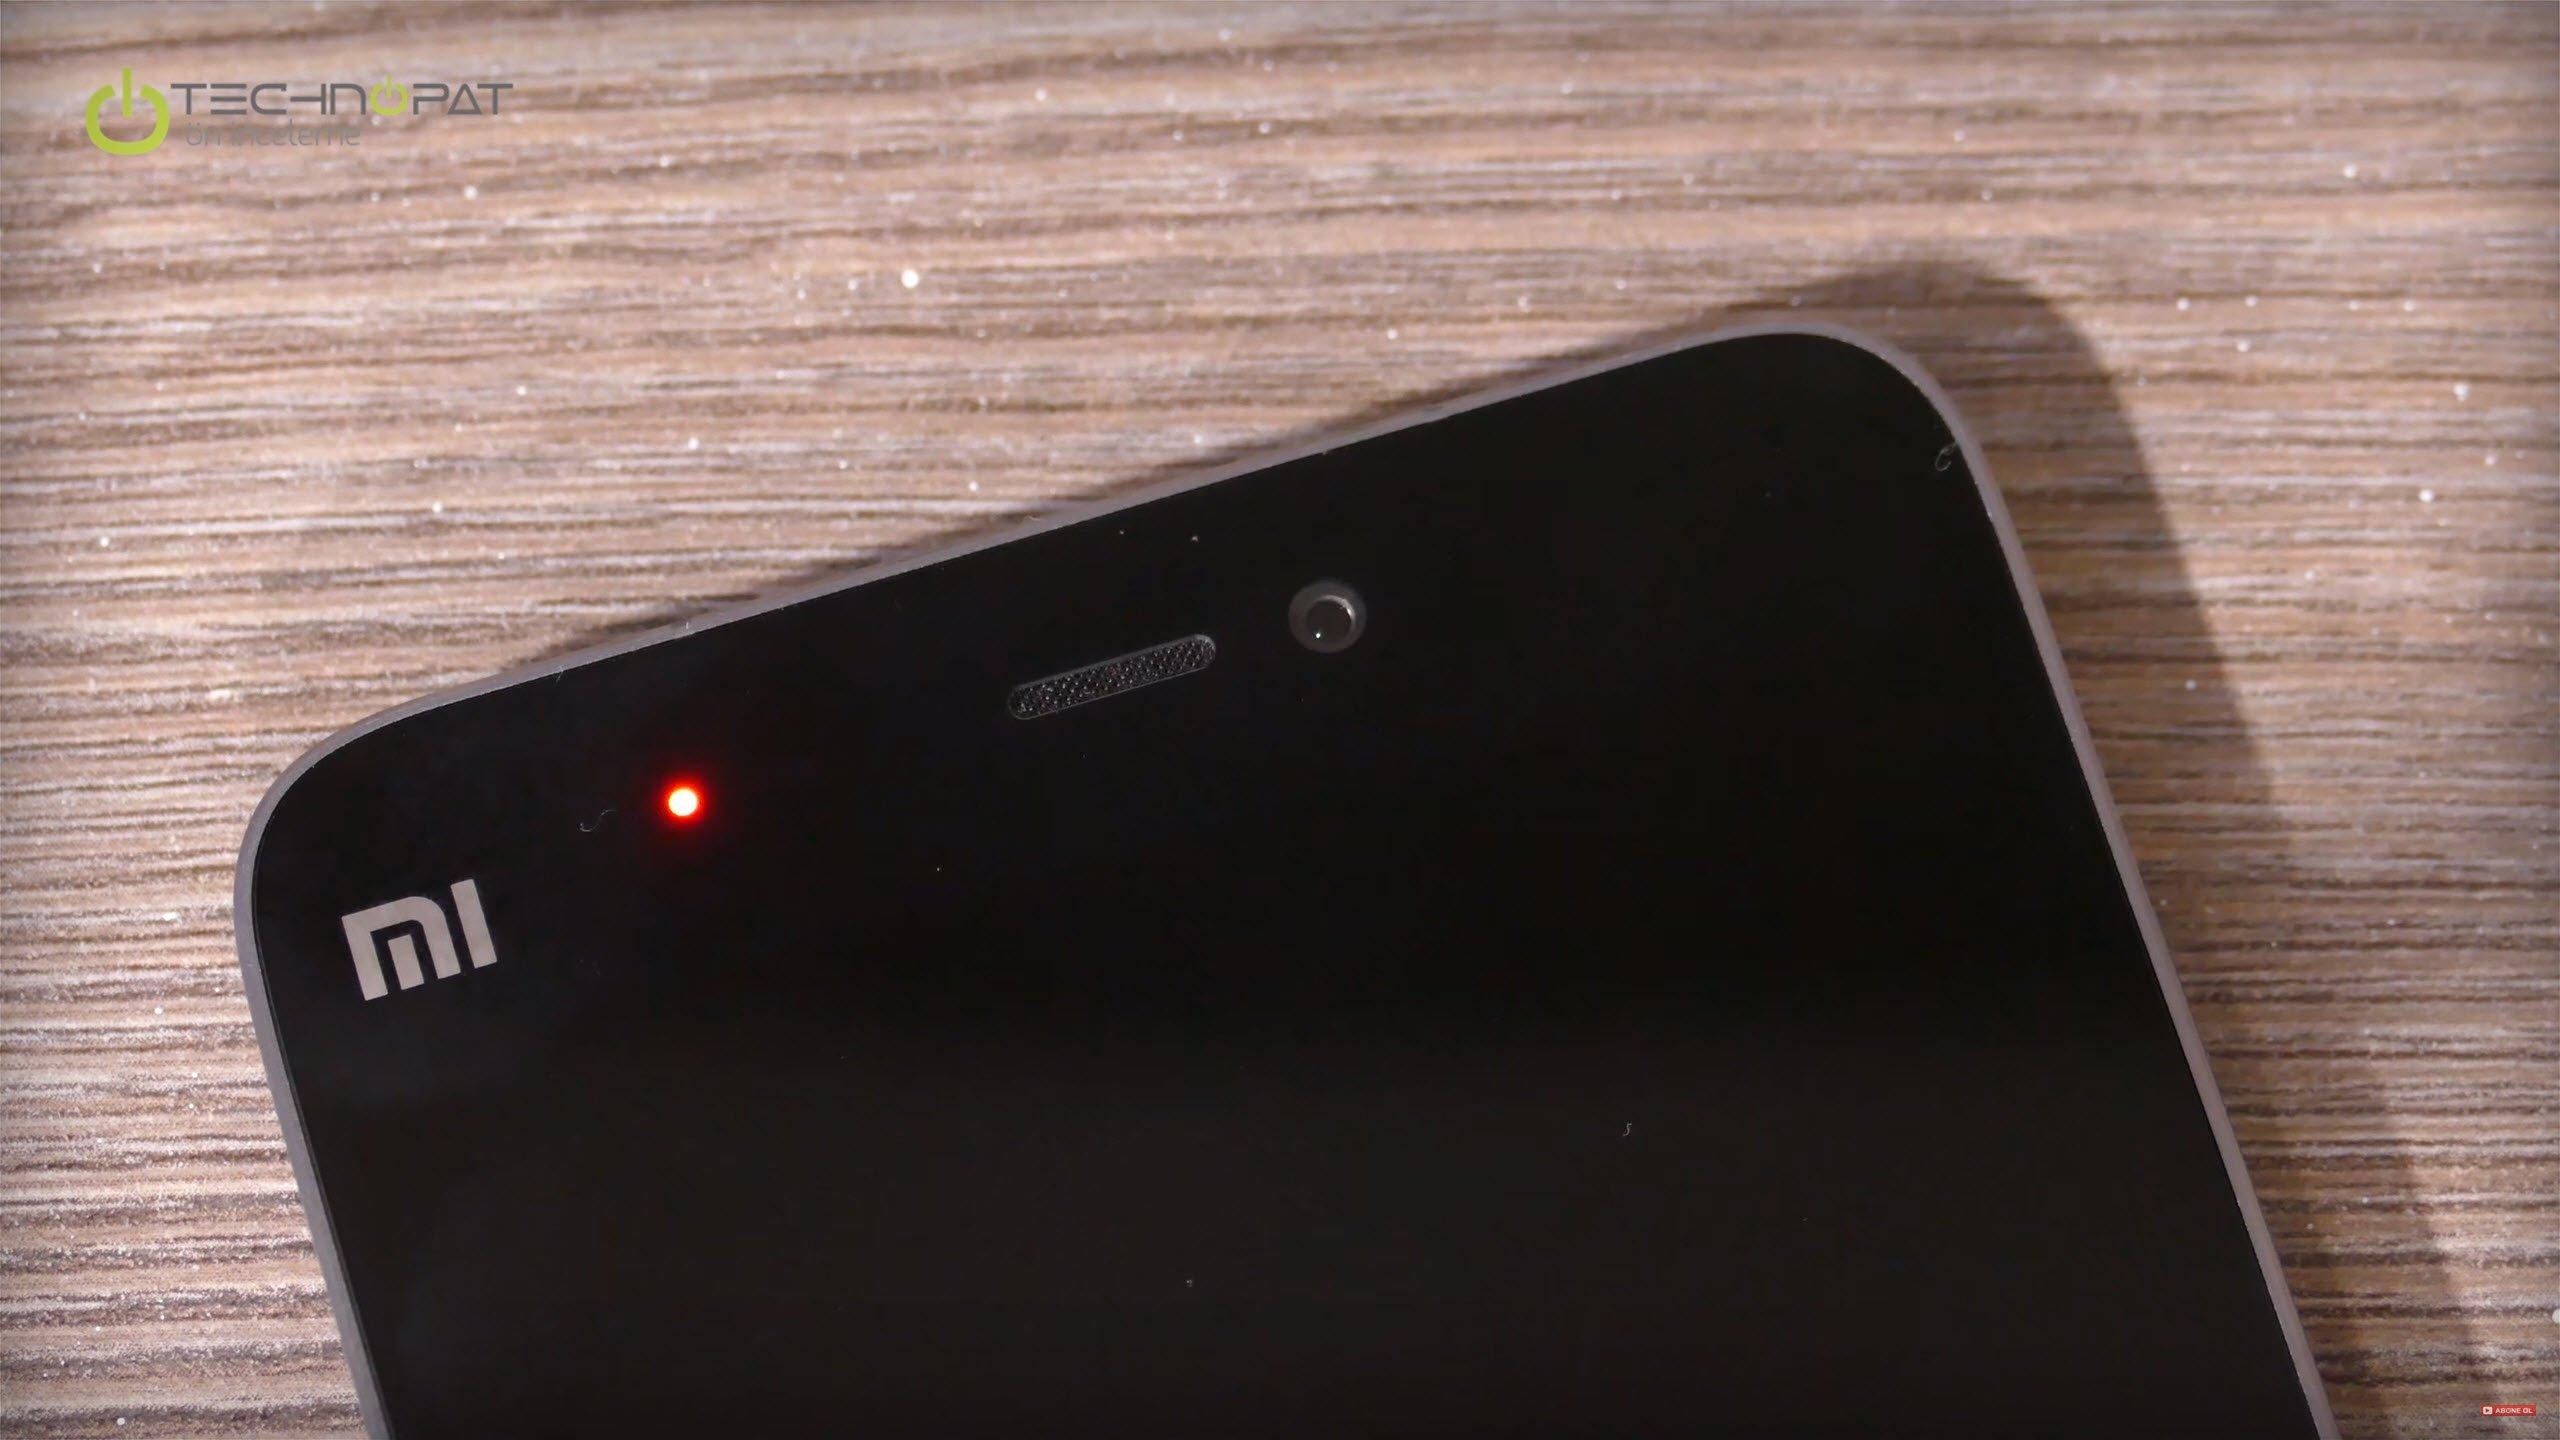 Xiaomi Mi 5 Pro: Ön kamera